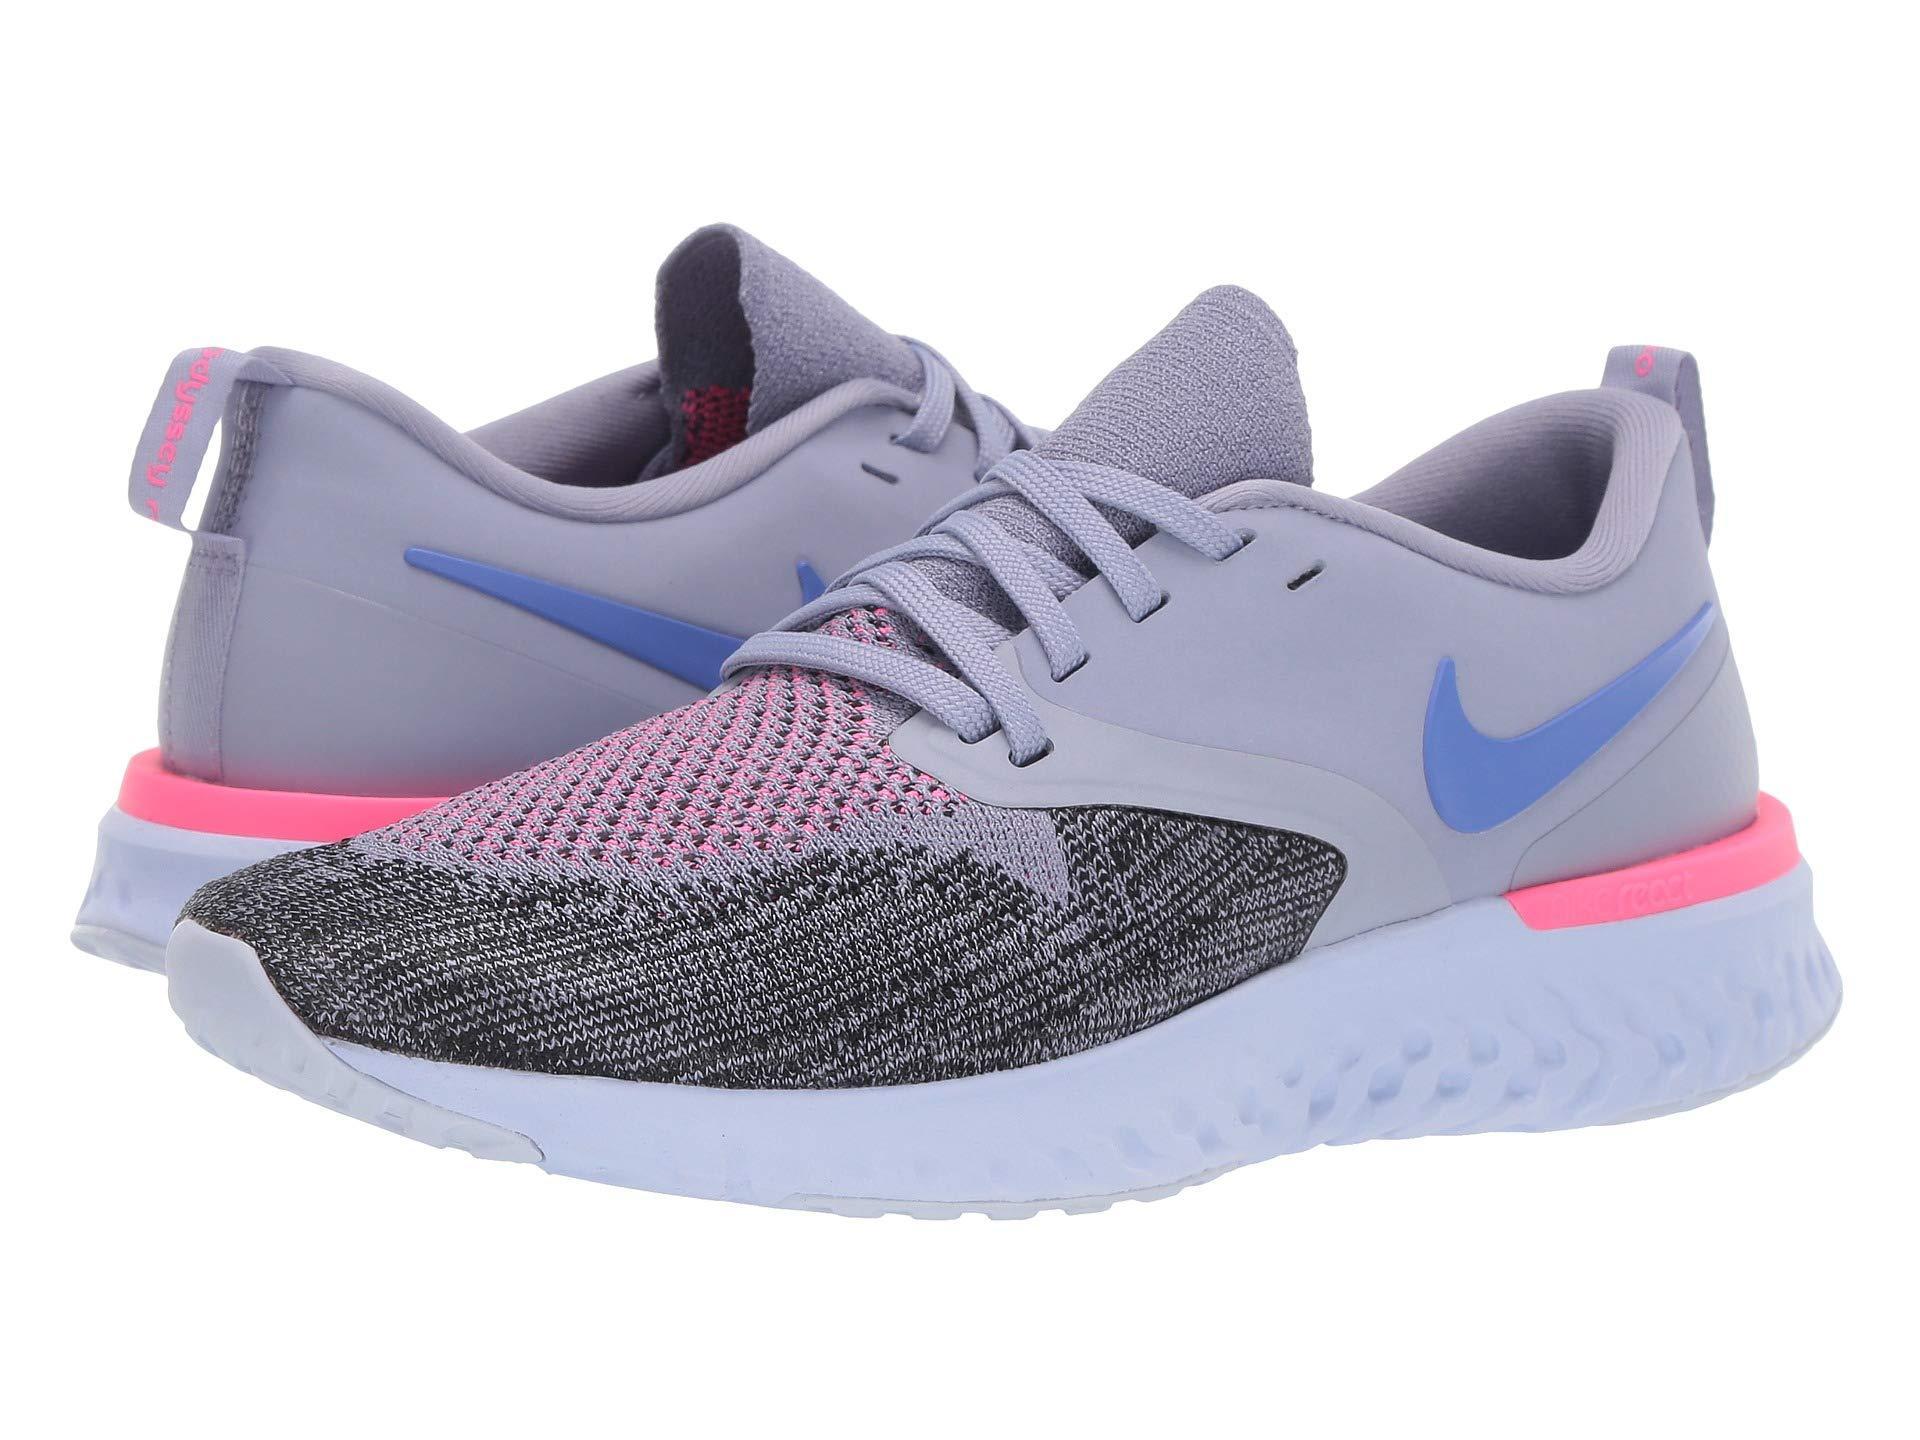 Lyst - Nike Odyssey React Flyknit 2 (black white) Women s Running ... 8bd6a974b